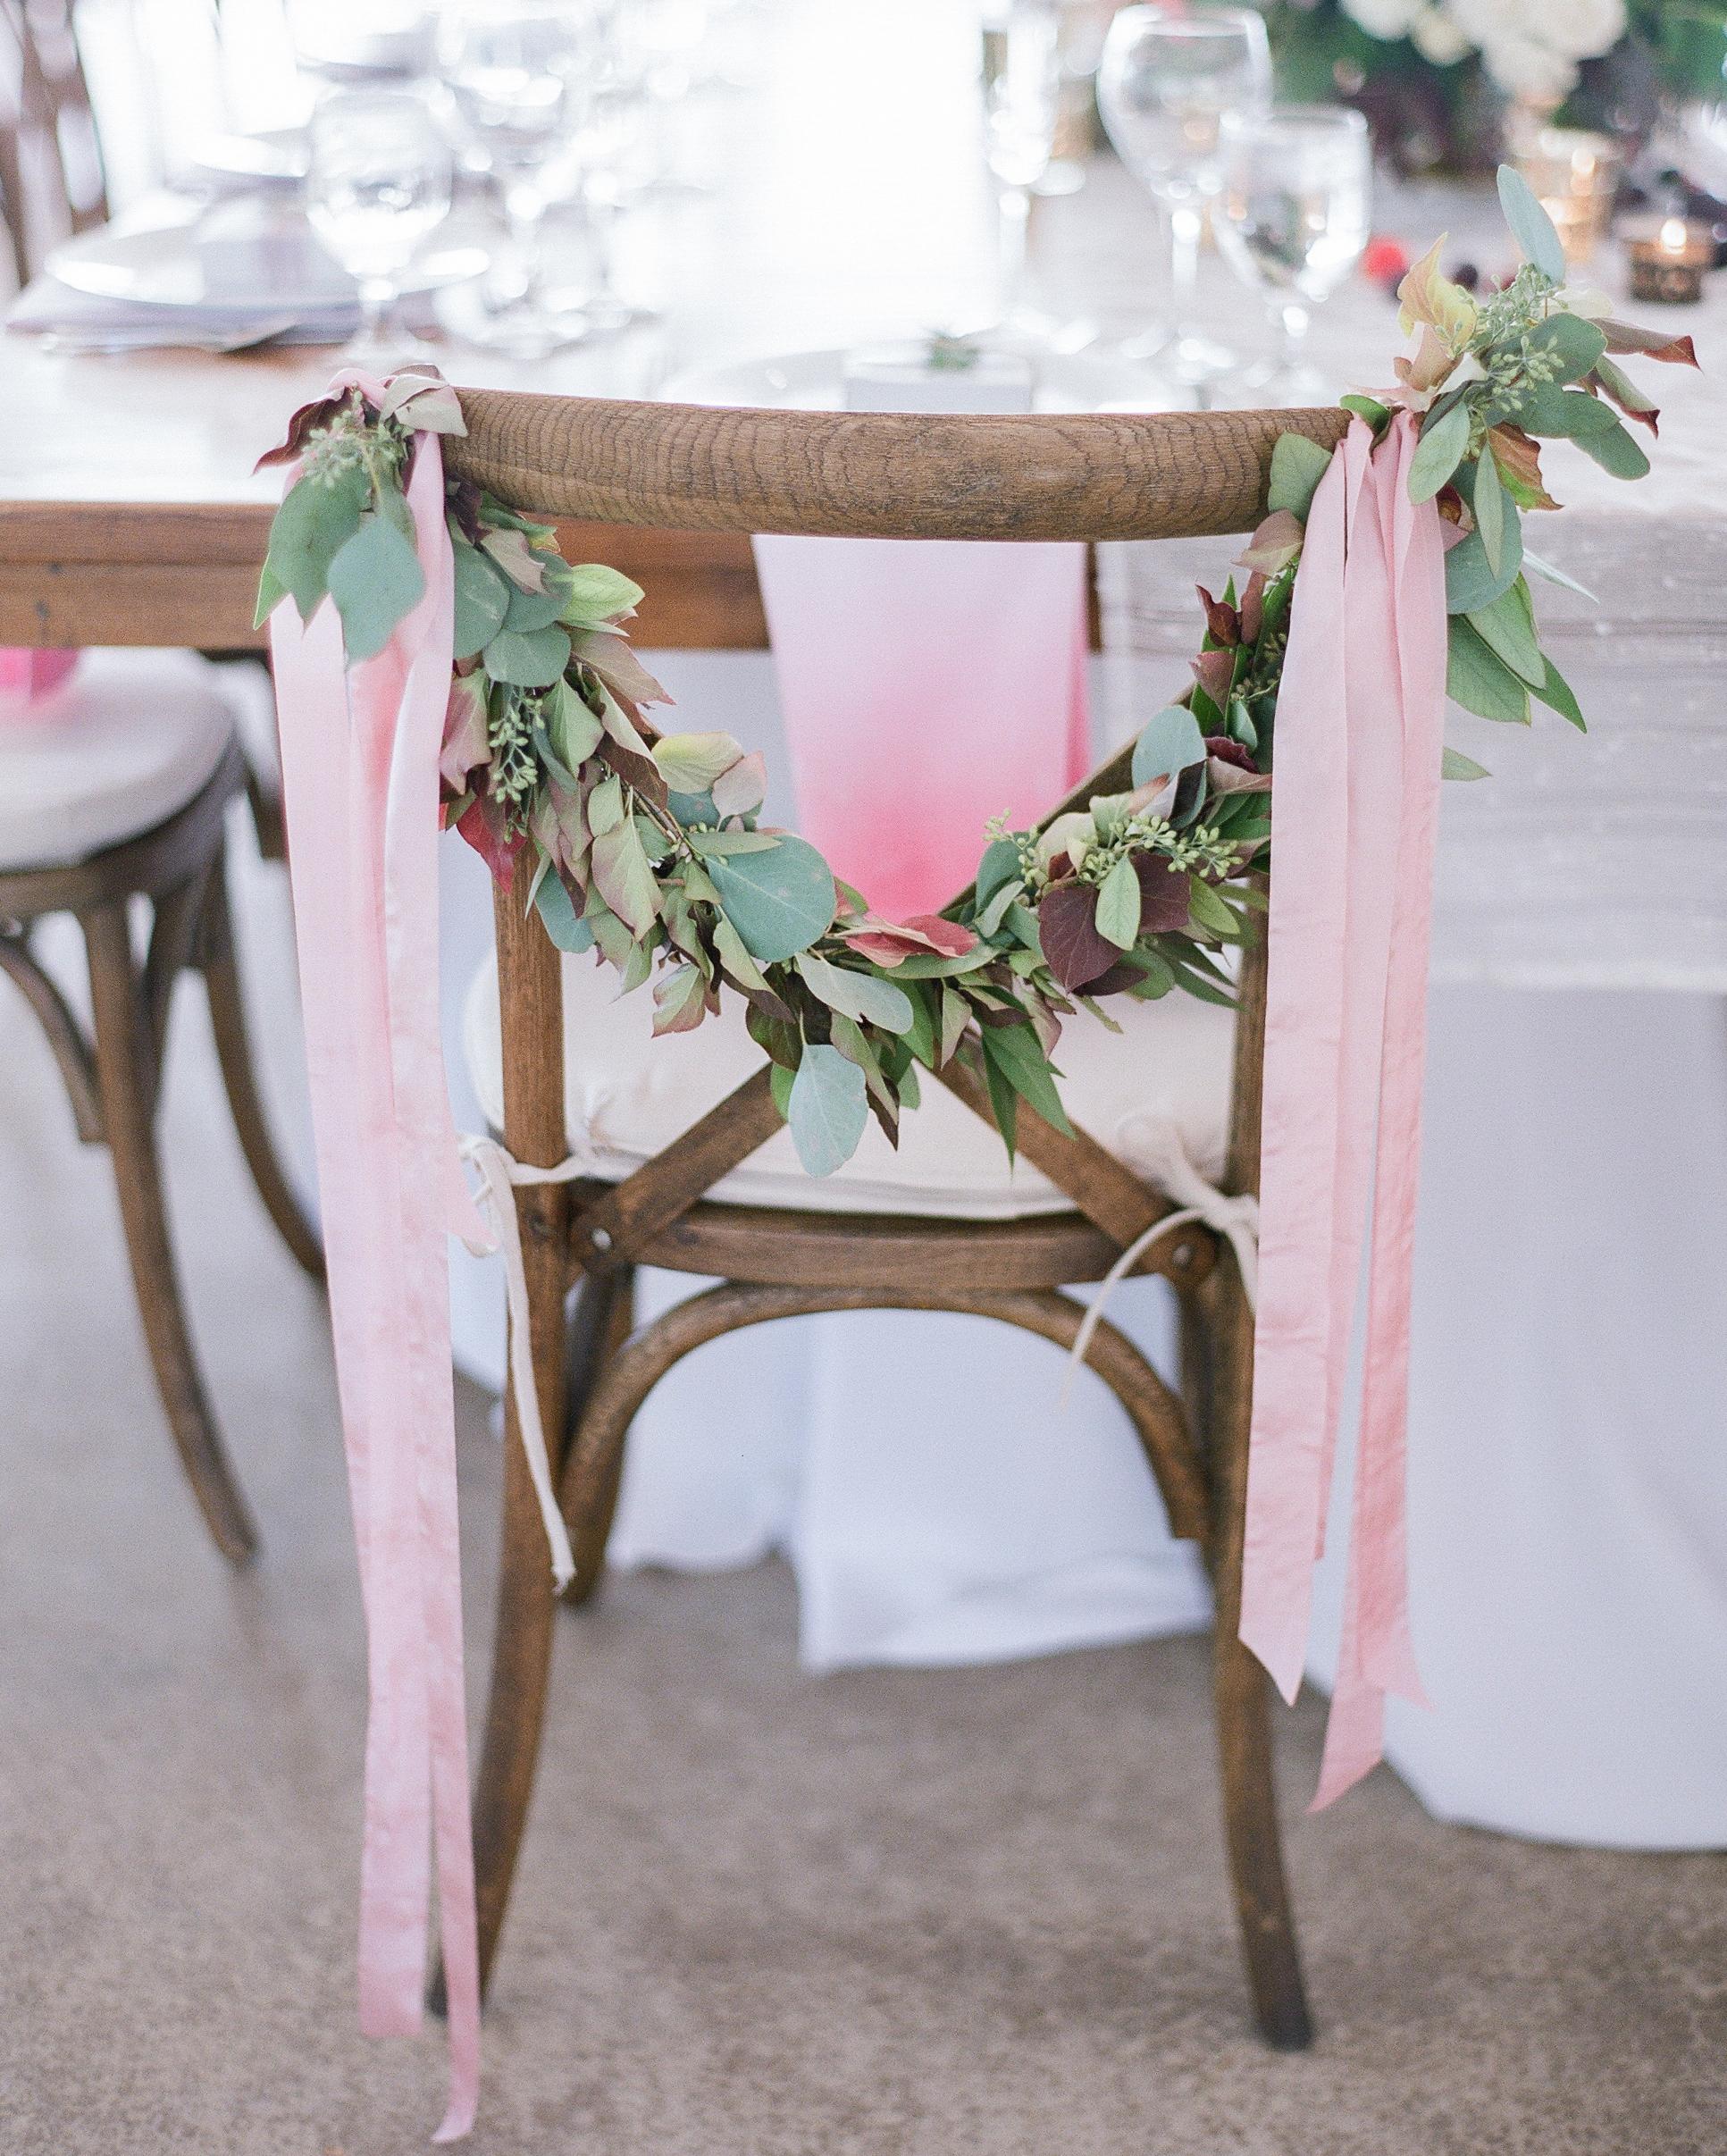 robin-kenny-wedding-chairback-014-s112068-0715.jpg